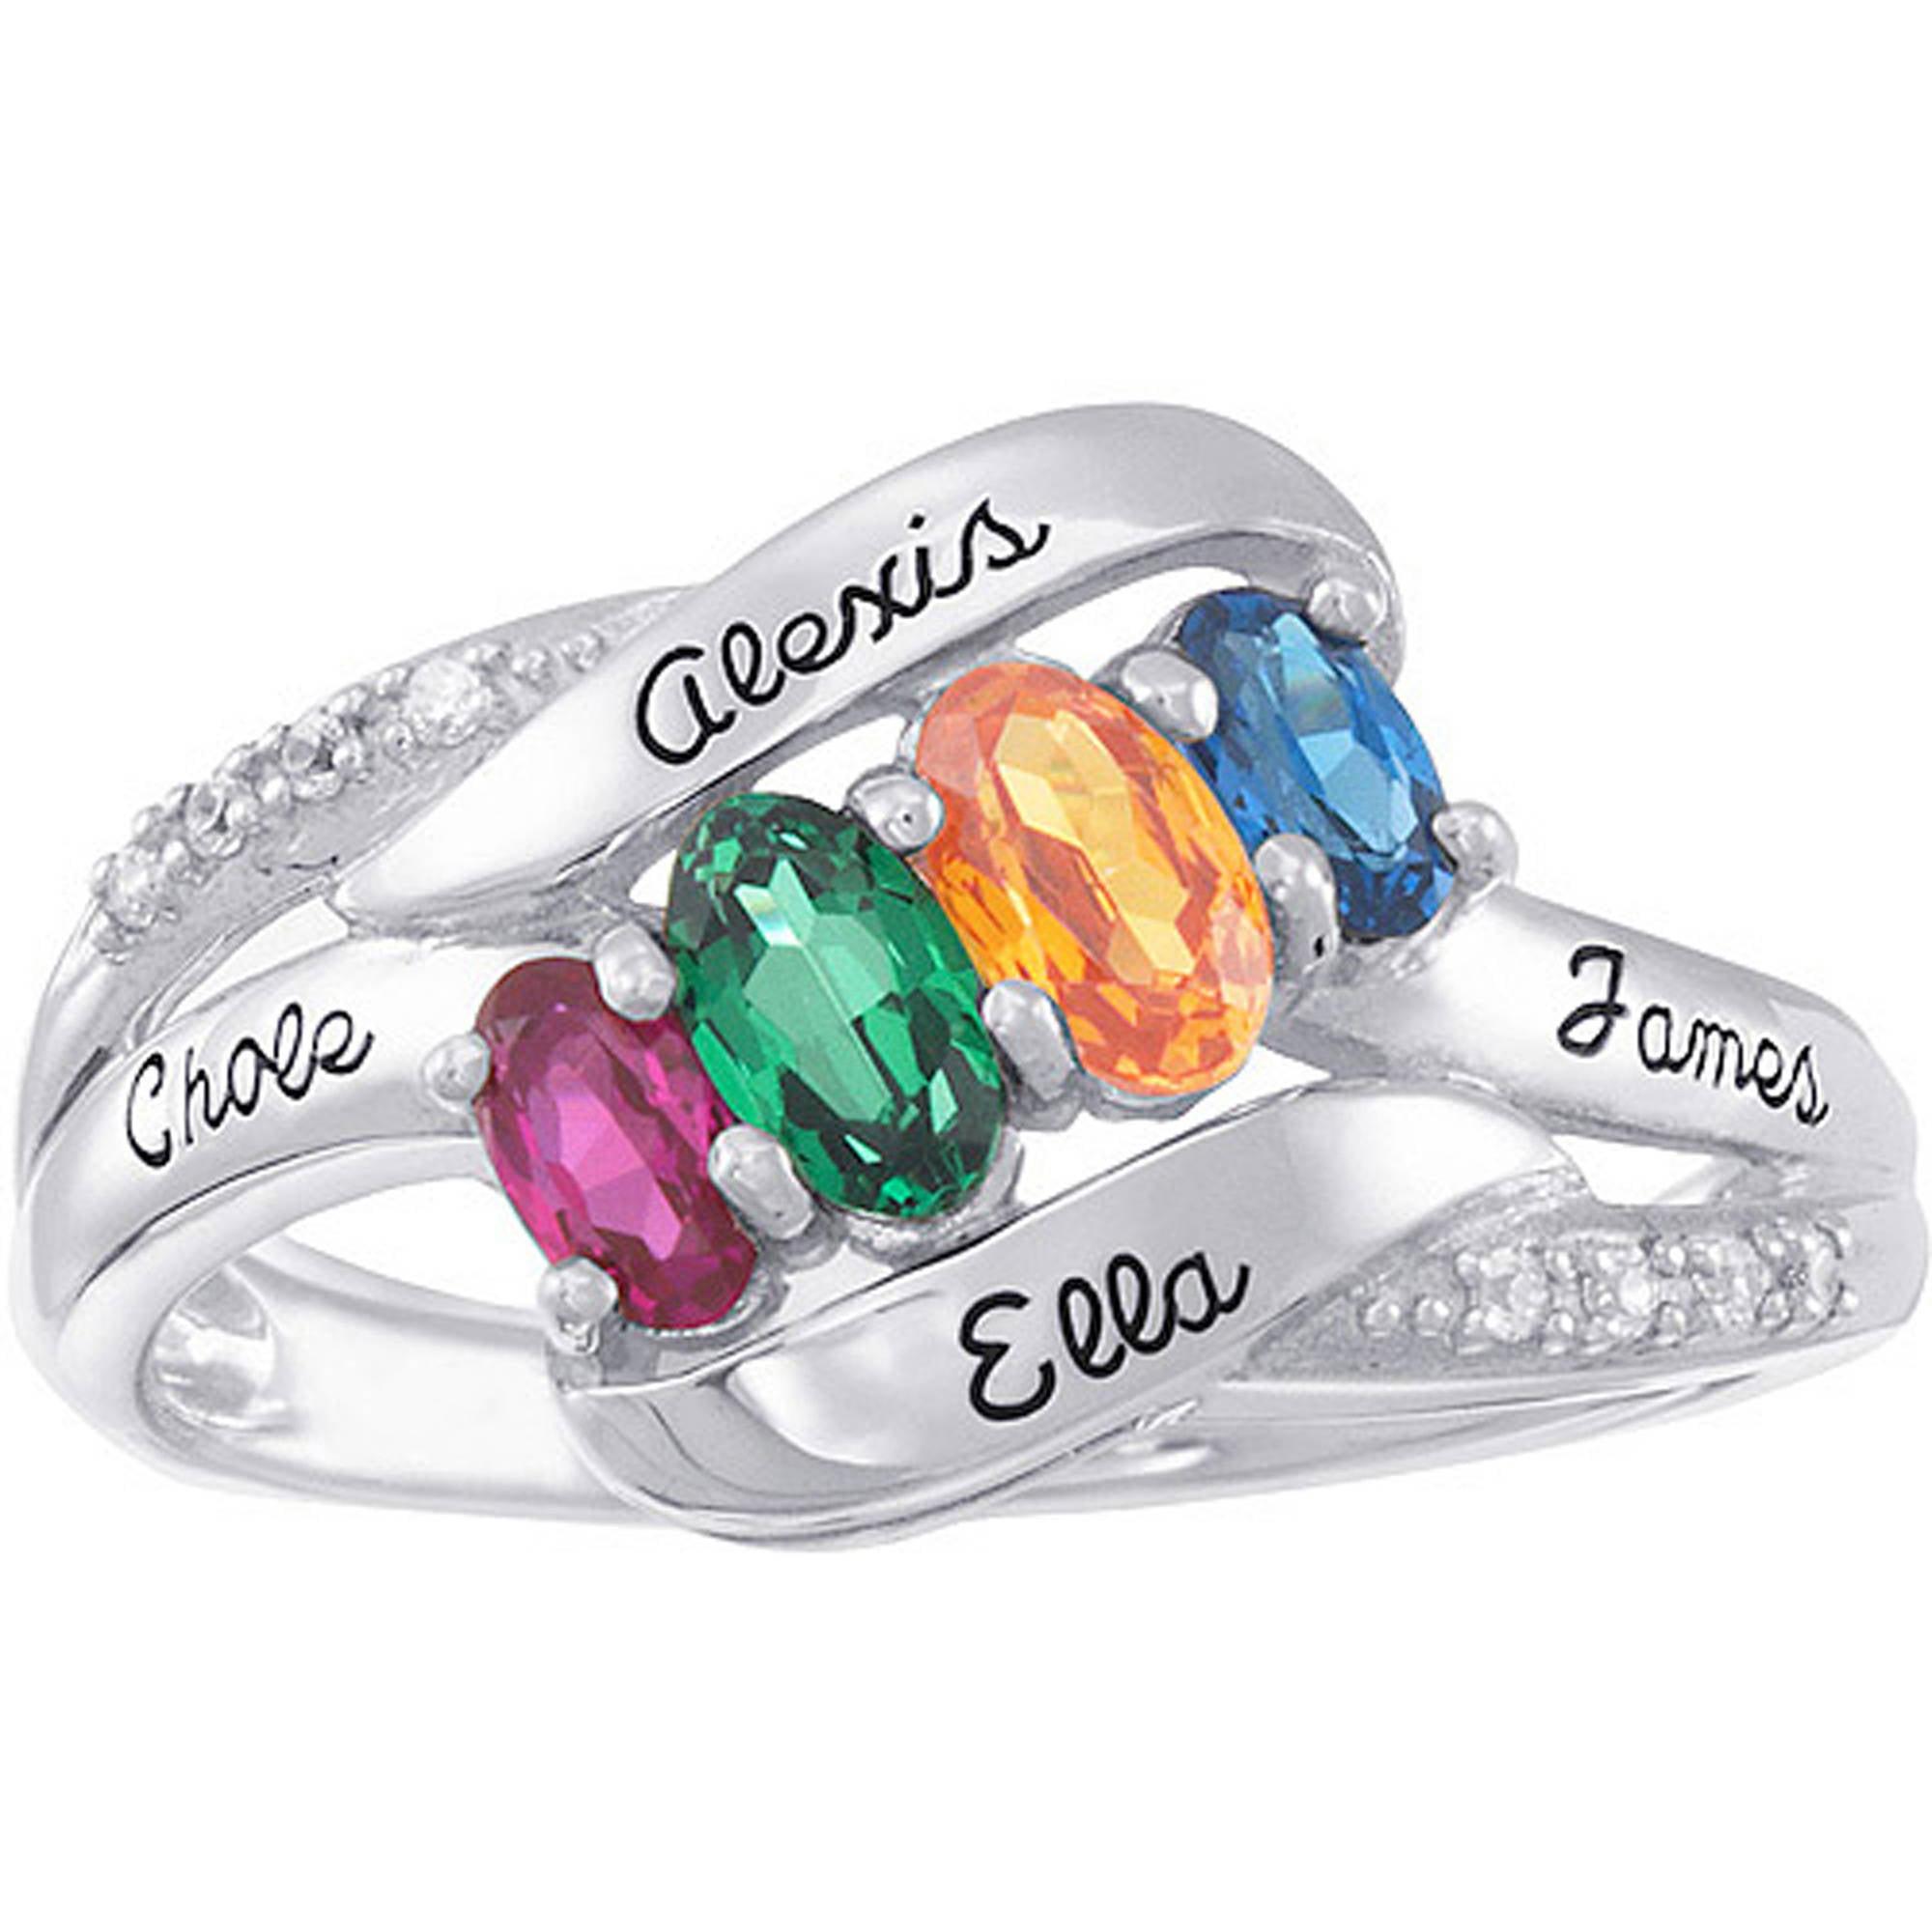 Personalized Keepsake Birthstone Solace Ring